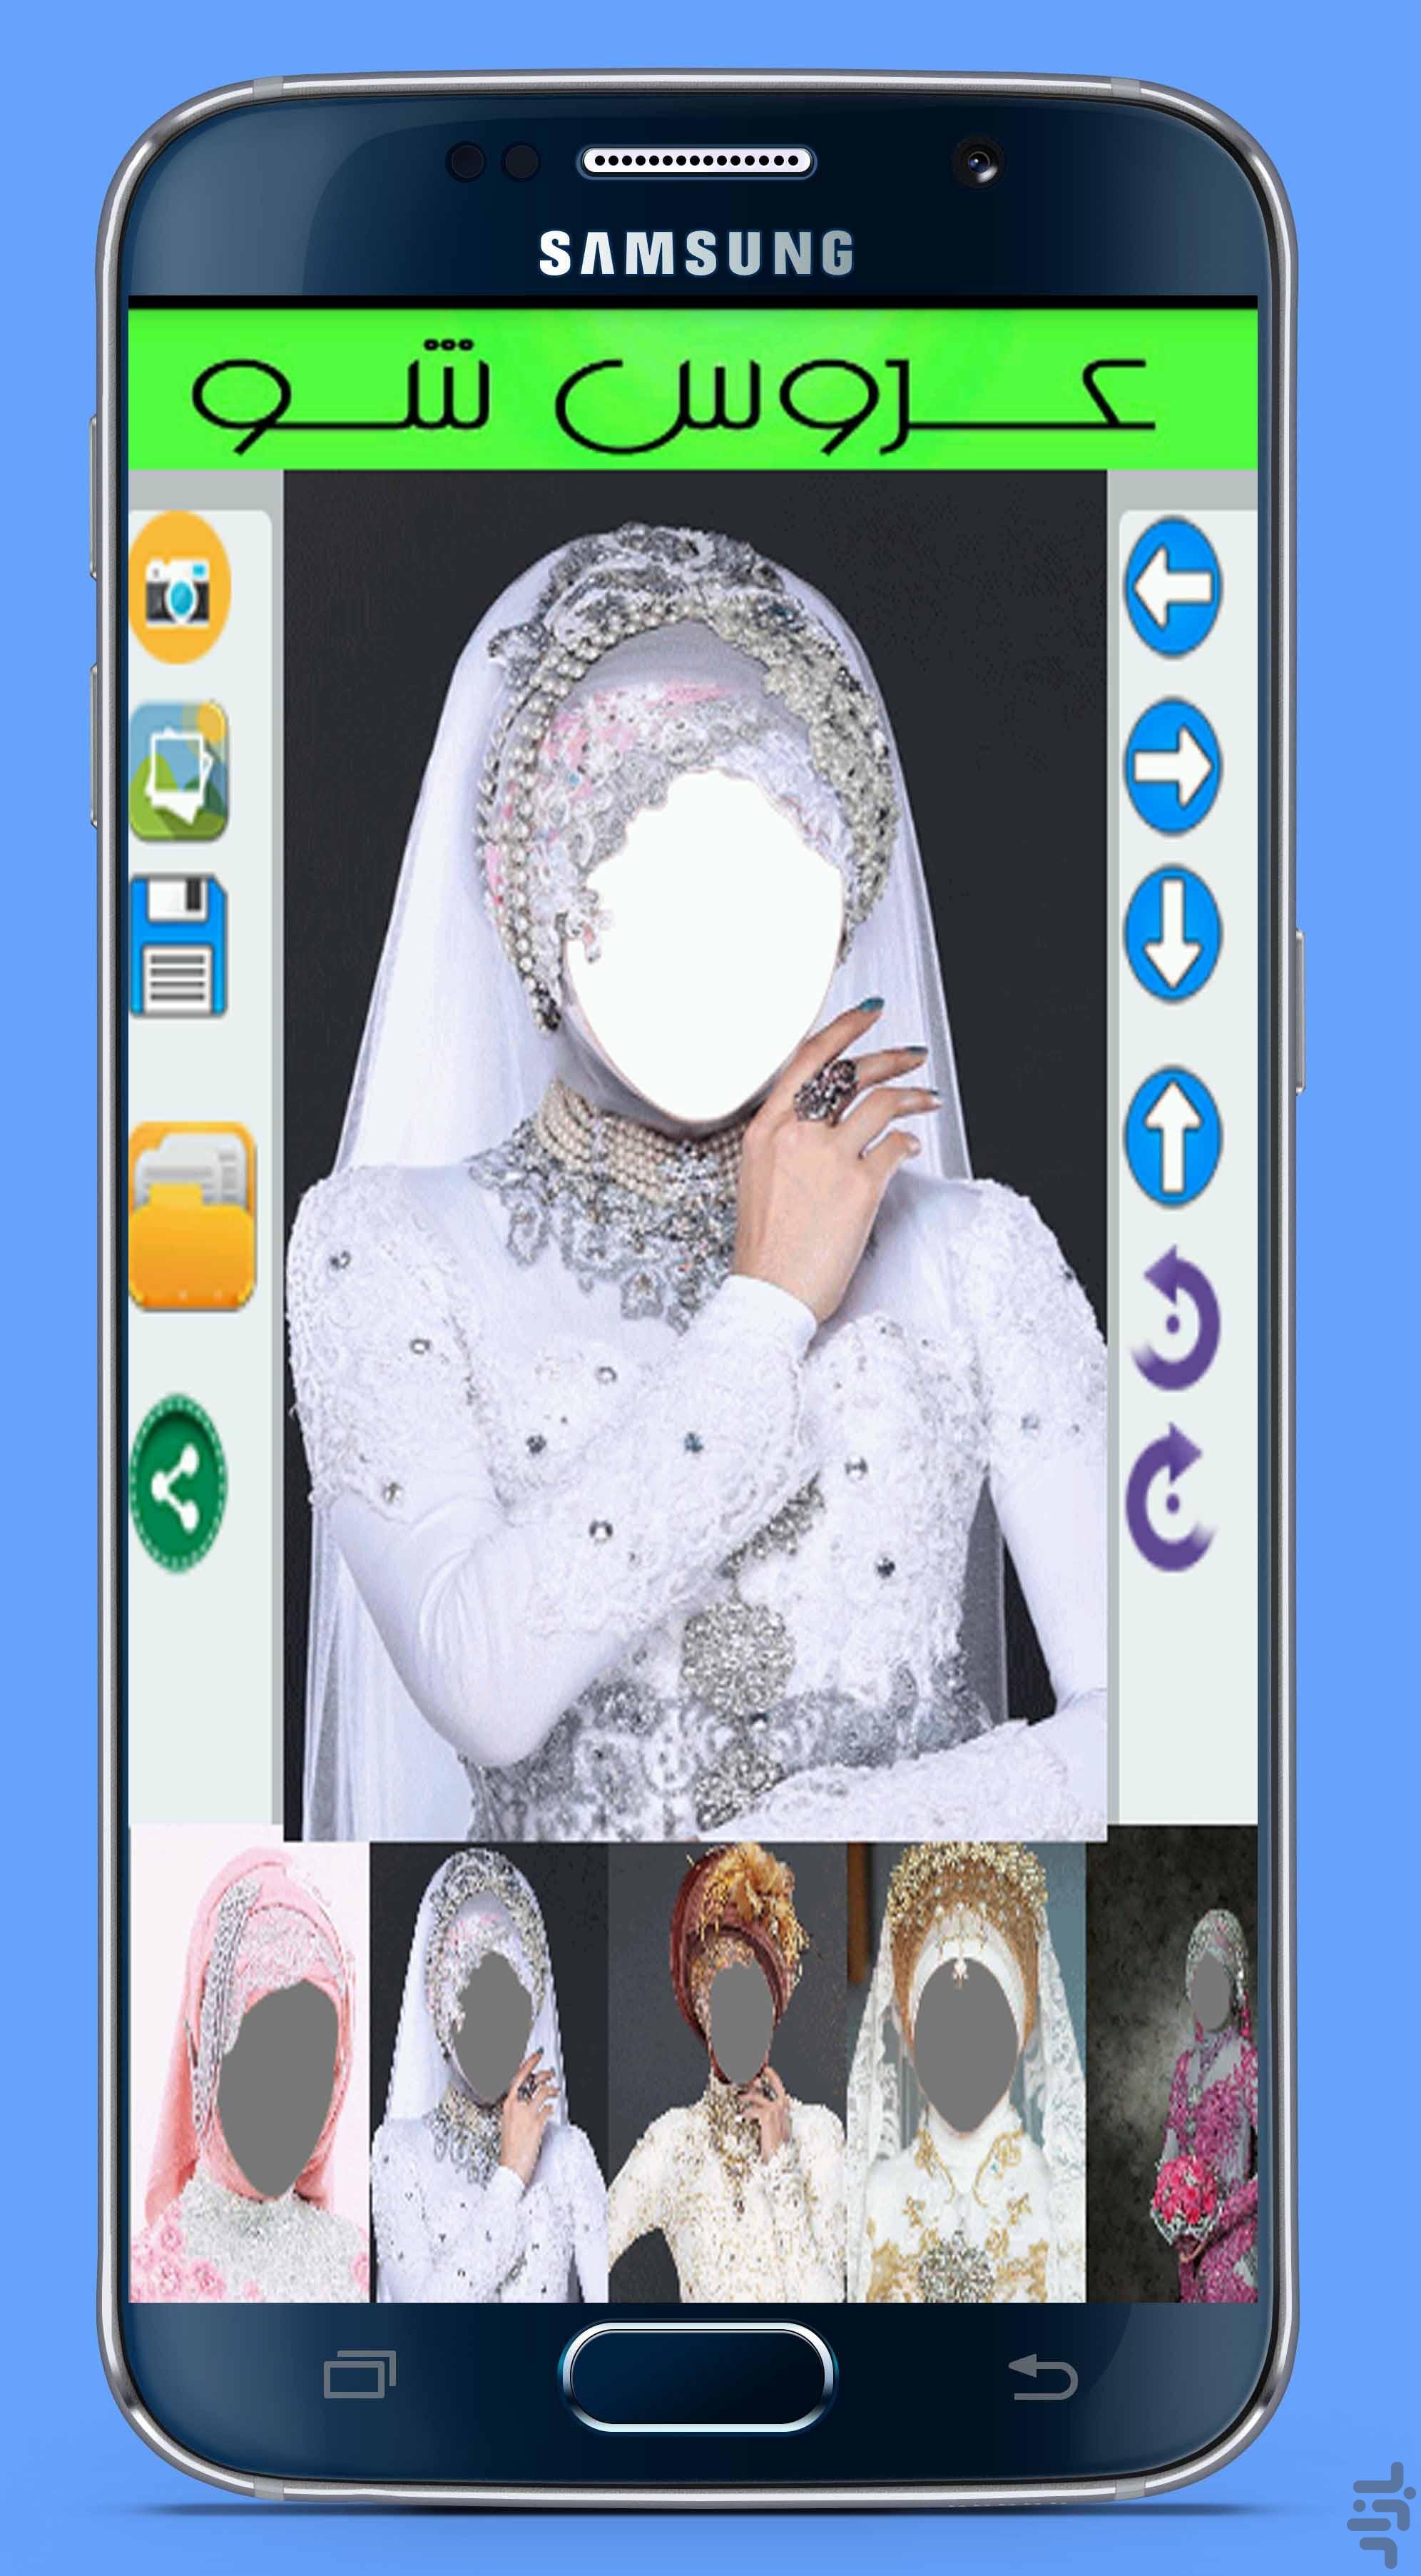 ع لباس زبوندار Скачать ع---روس ش---و( لباس عروس بپوش ) APK 1.1 для Андроид - другое скачать бесплатно.